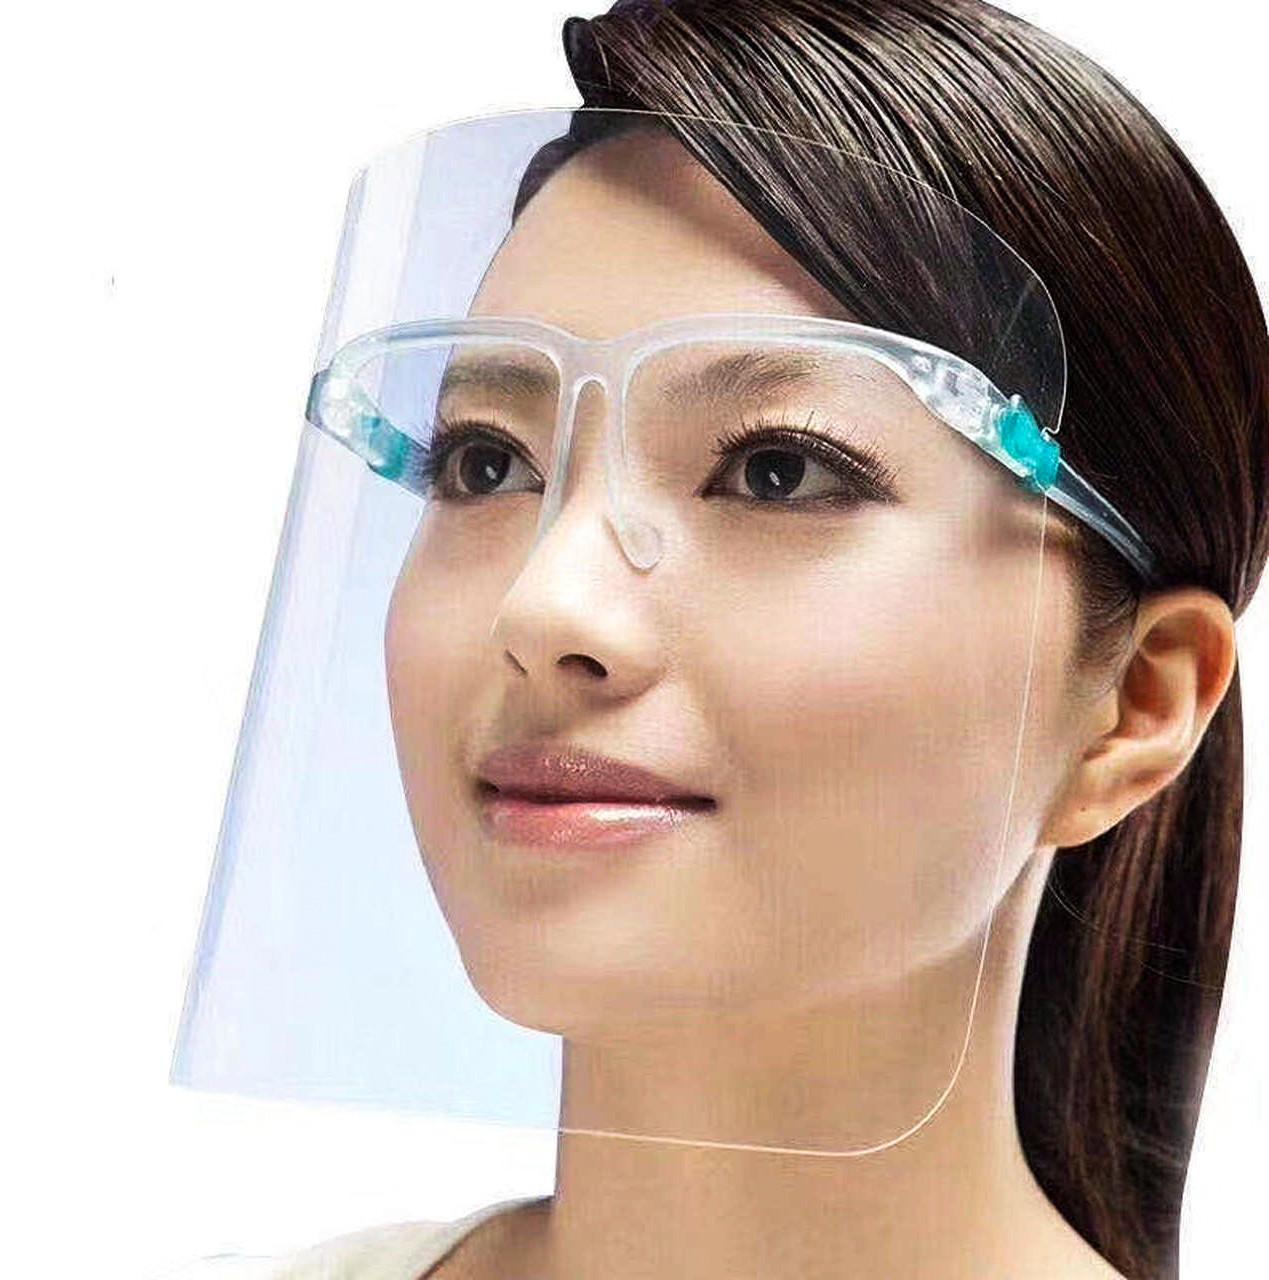 Защитный щиток экран для лица прозрачный пластик на оправе со складными дужками 165х195 мм FACE SHIELD Glasses